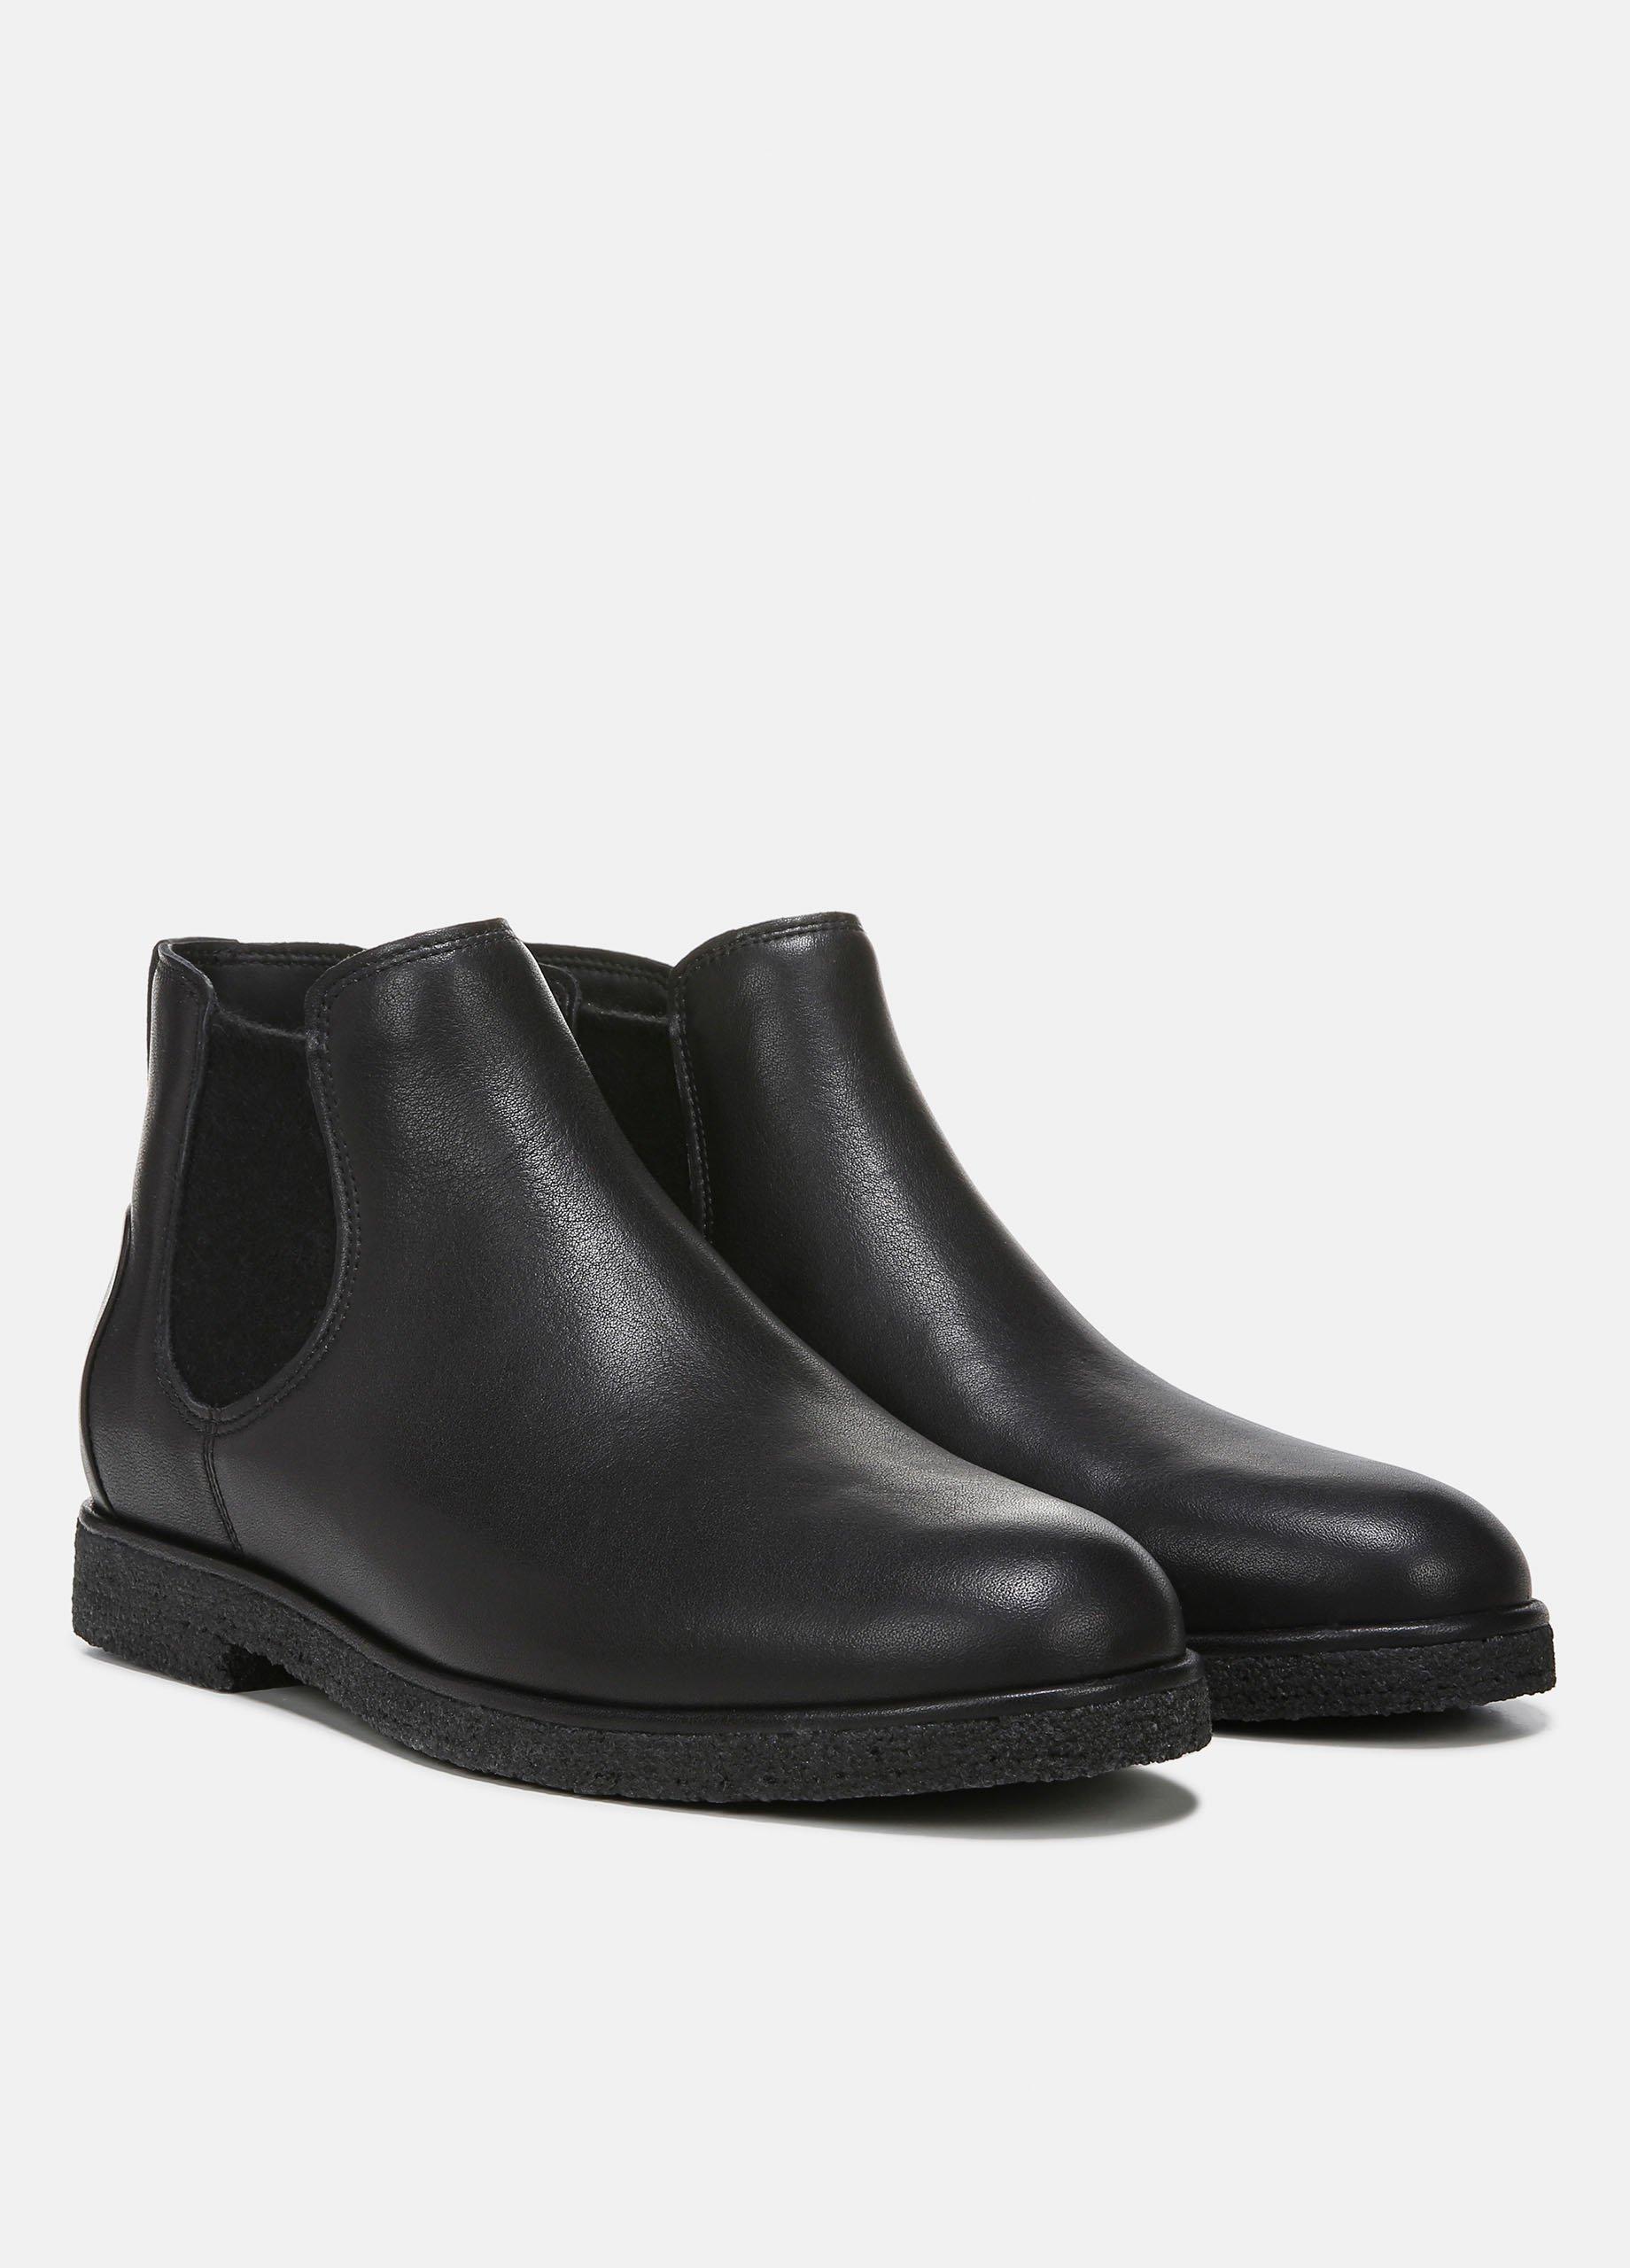 Bonham Leather Boot